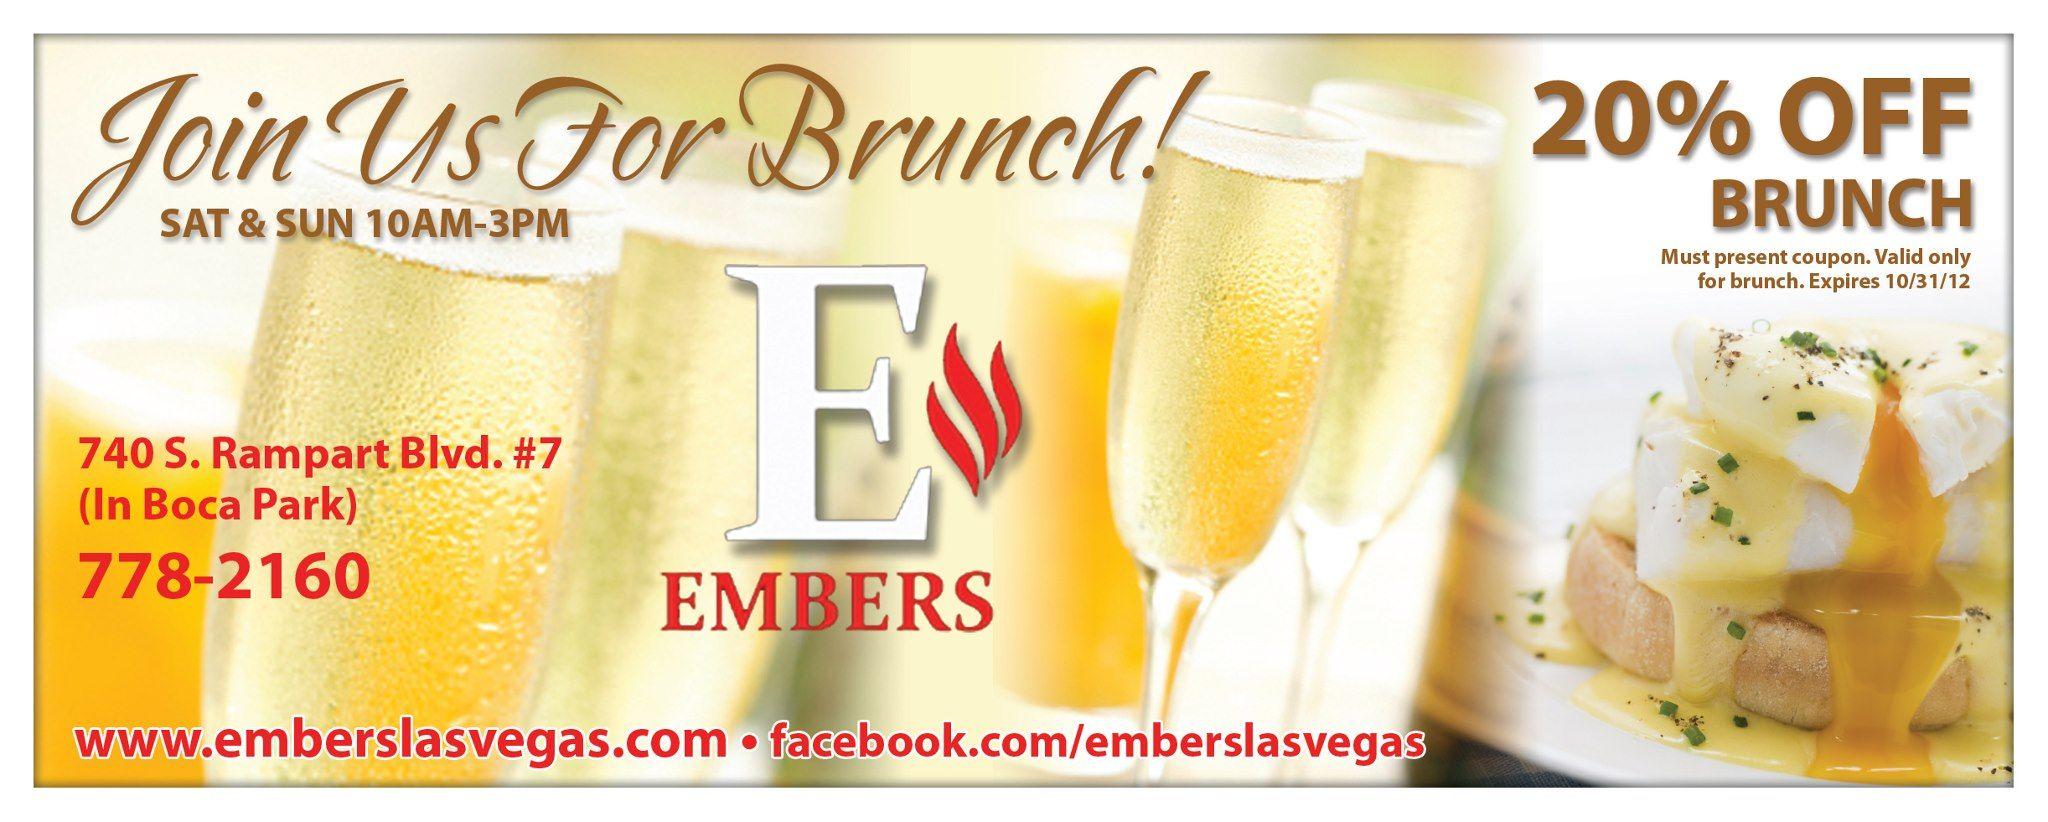 Direct Mail Design for Ember's Las Vegas